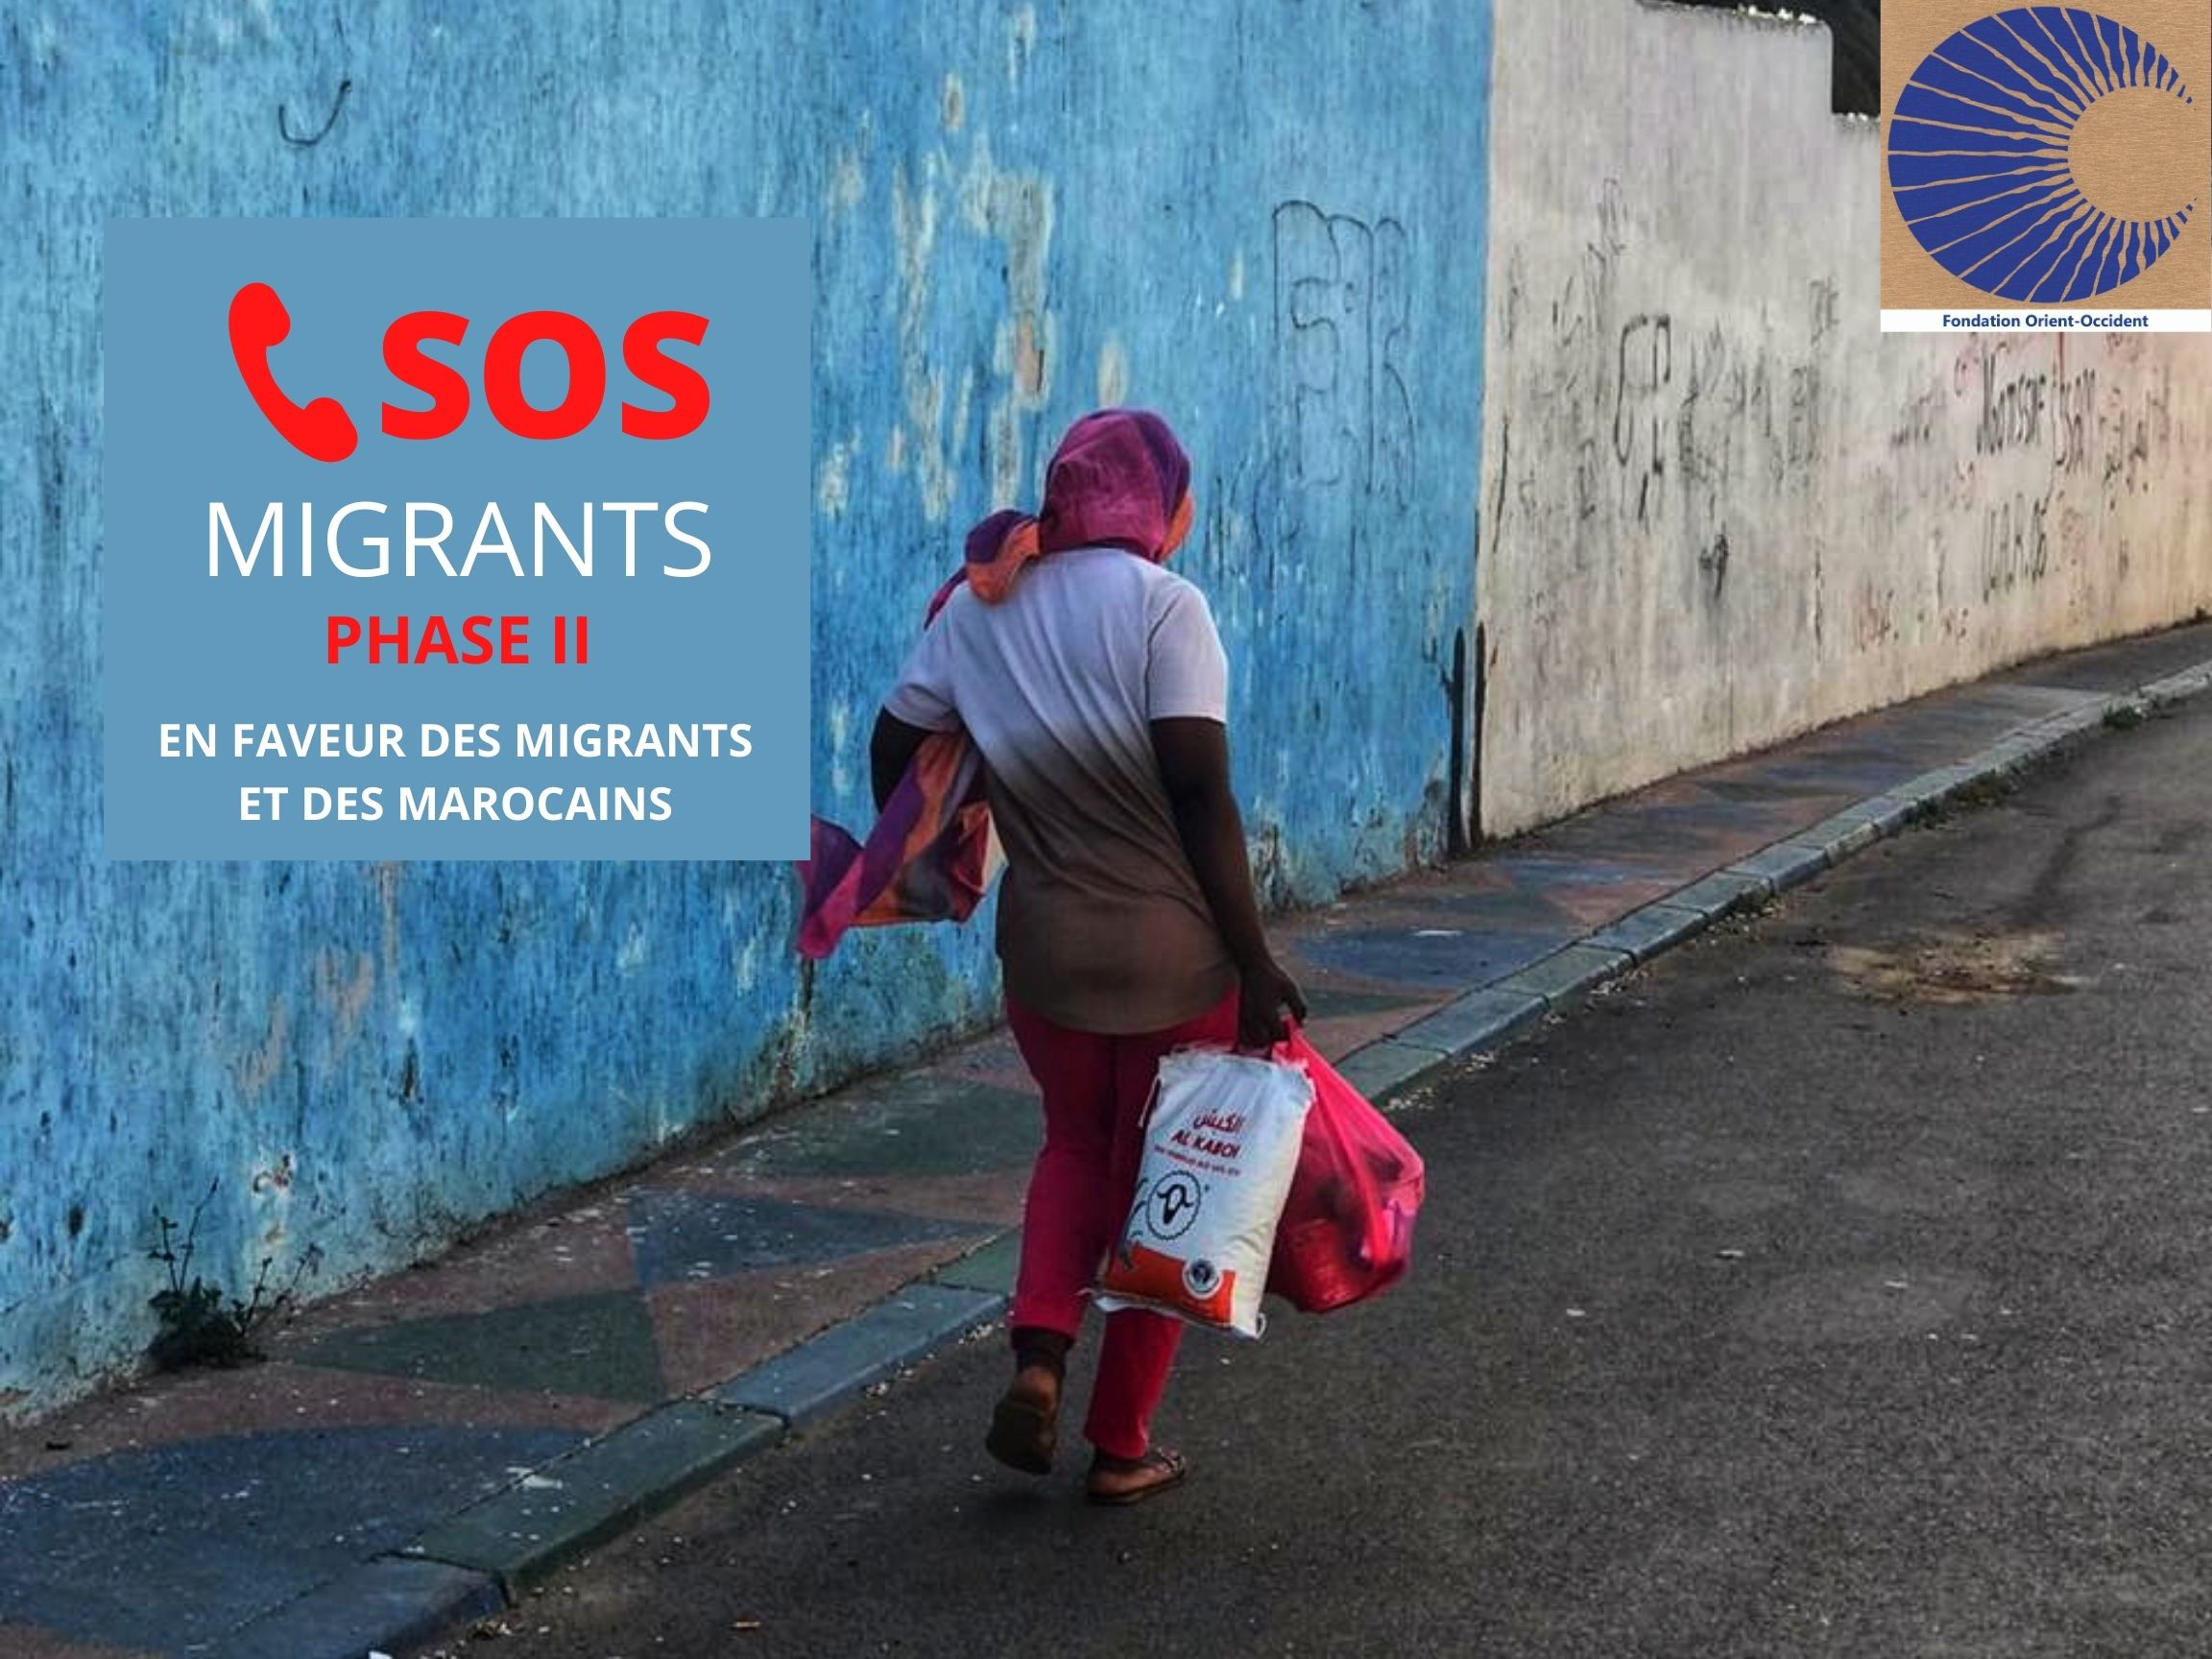 SOS Migrants Phase II